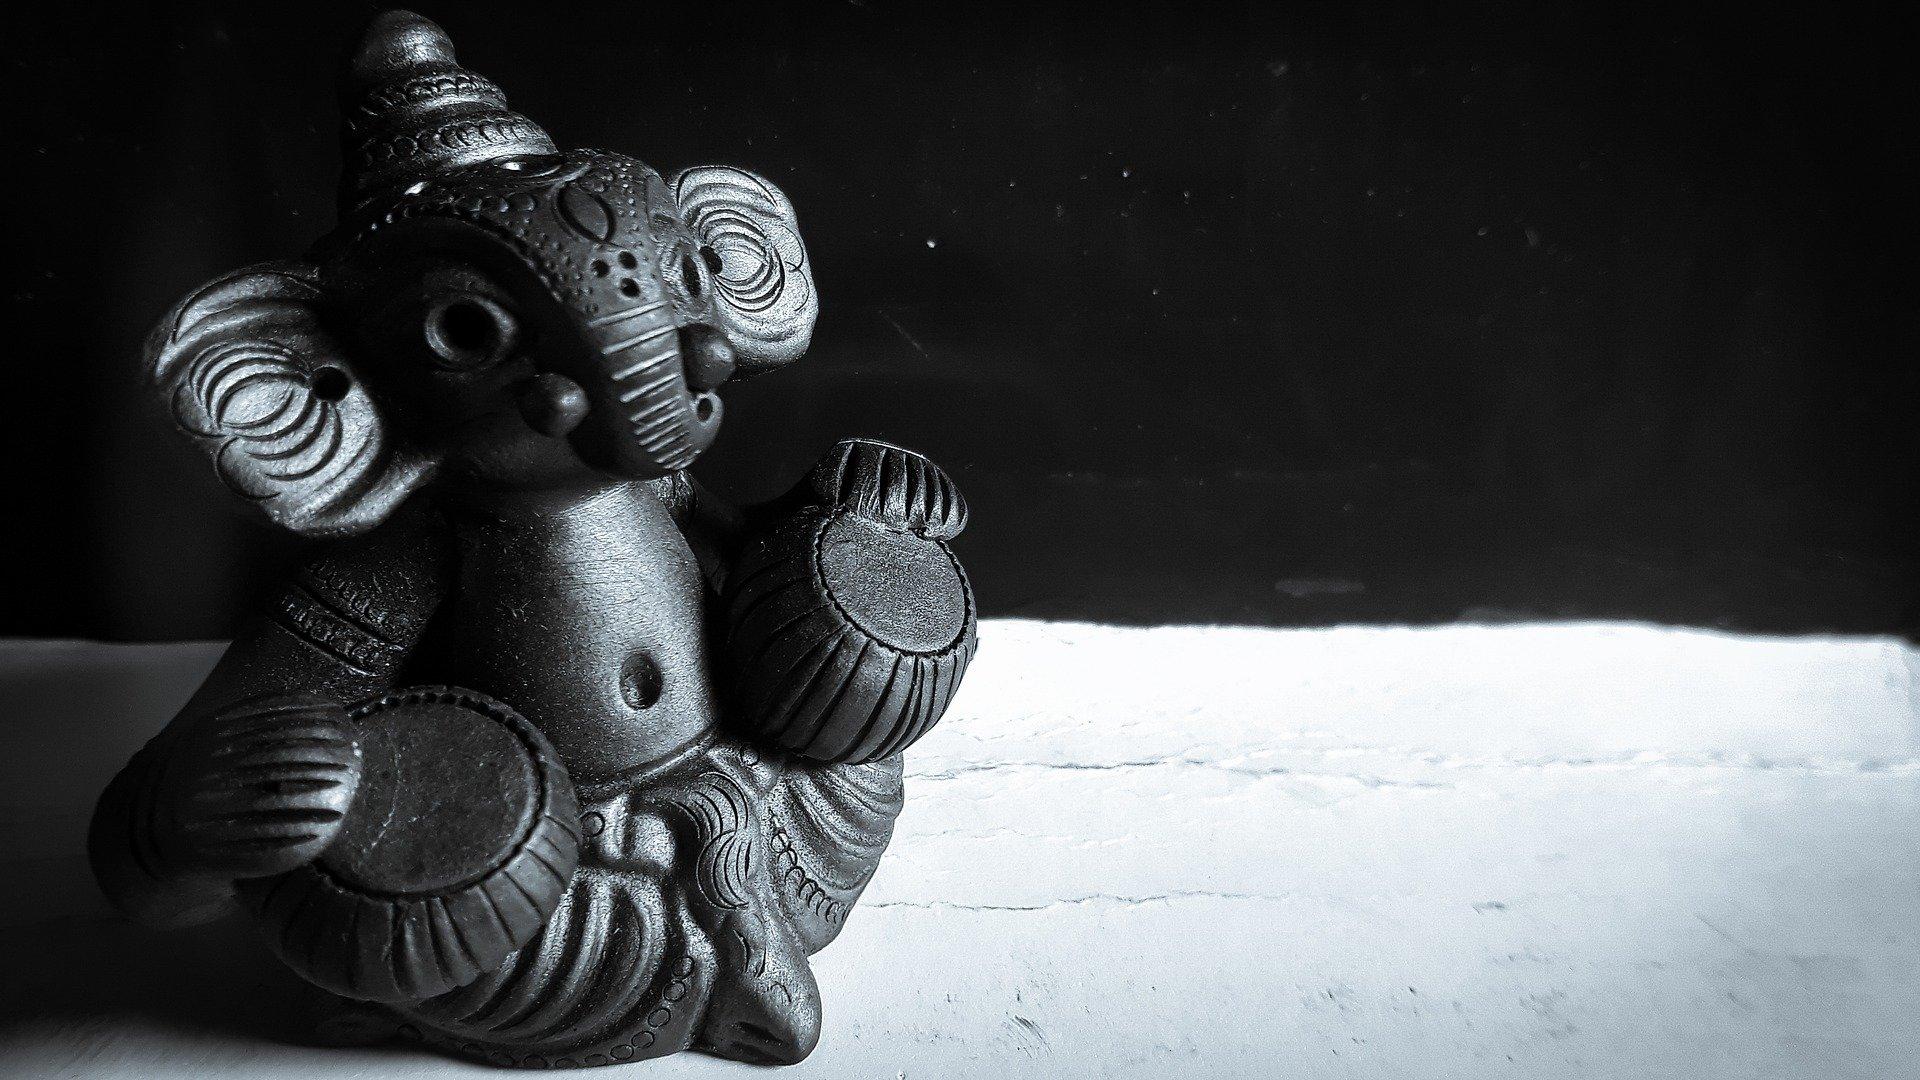 lord-ganesh-2936602_1920